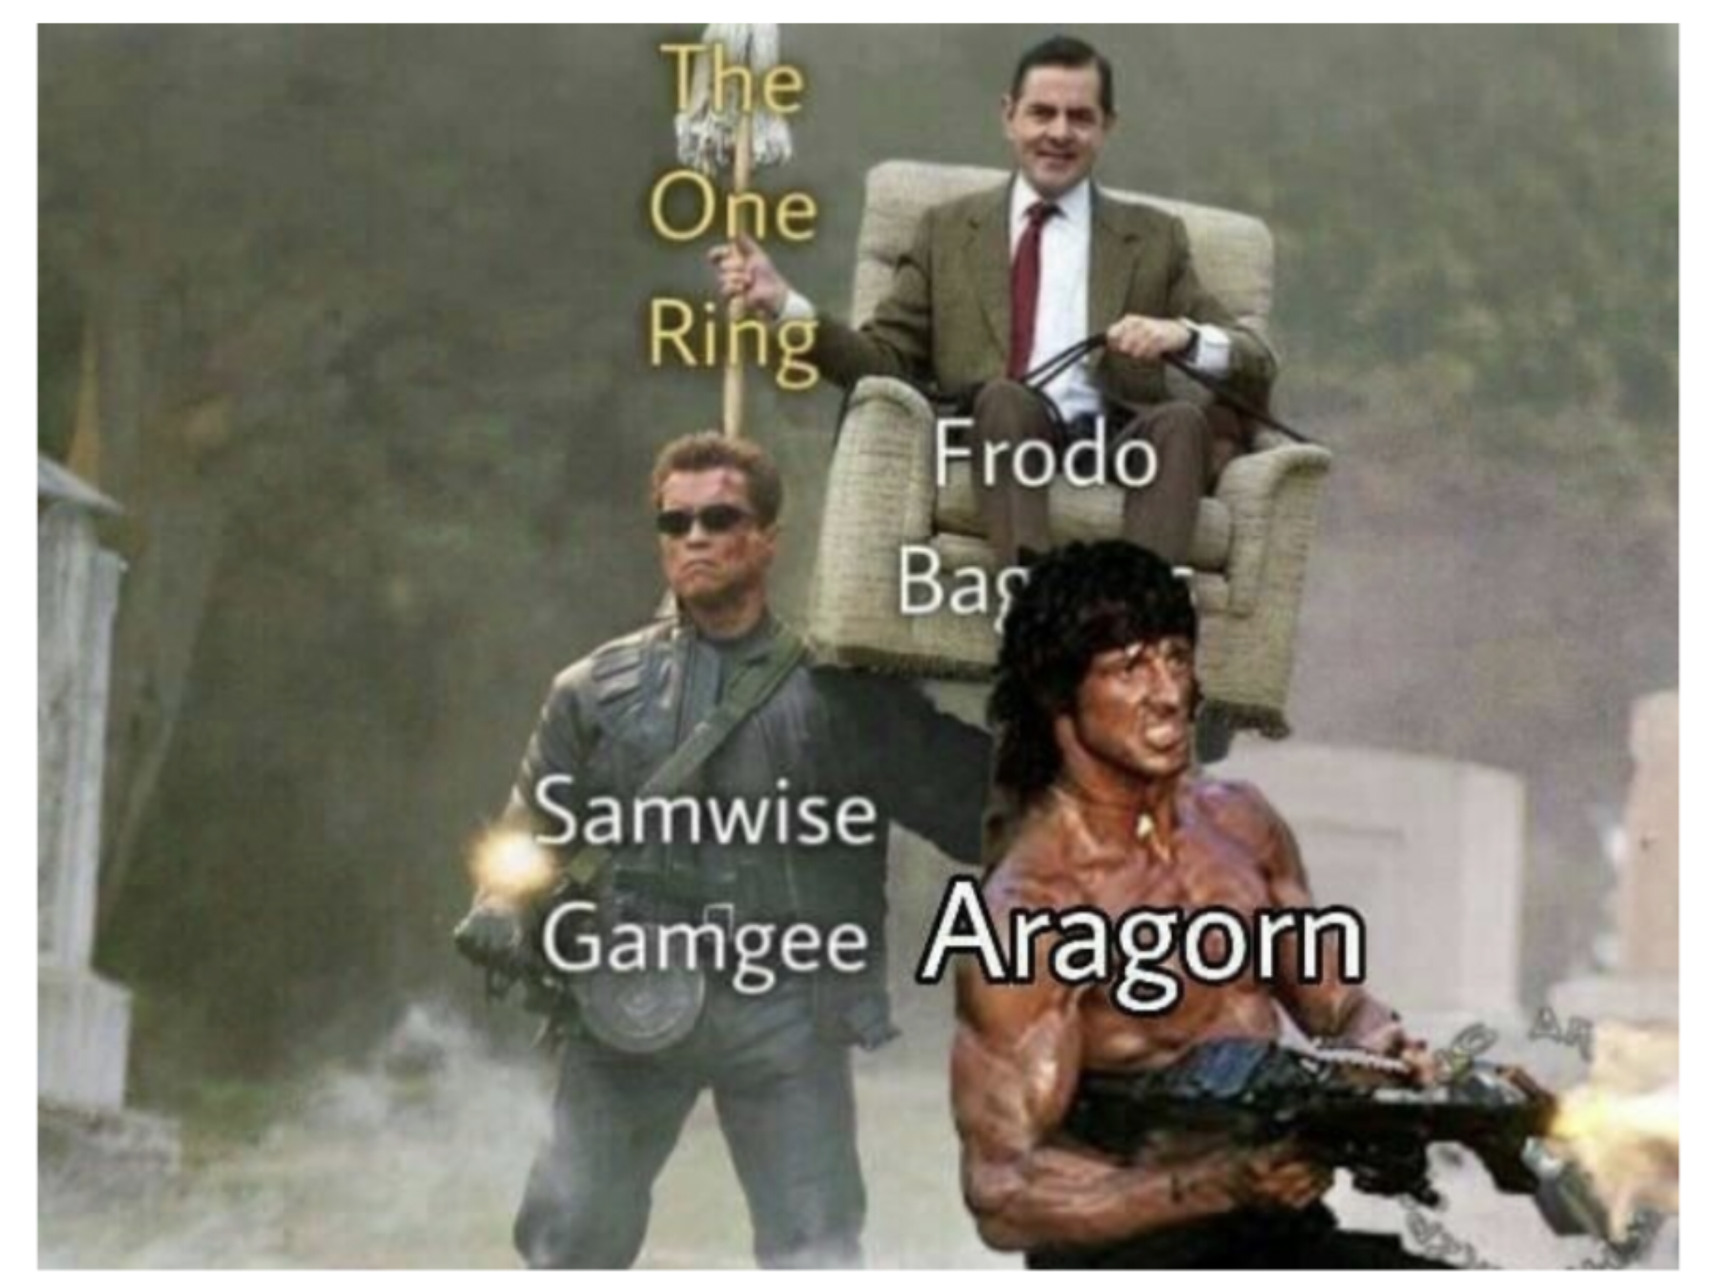 To true - meme